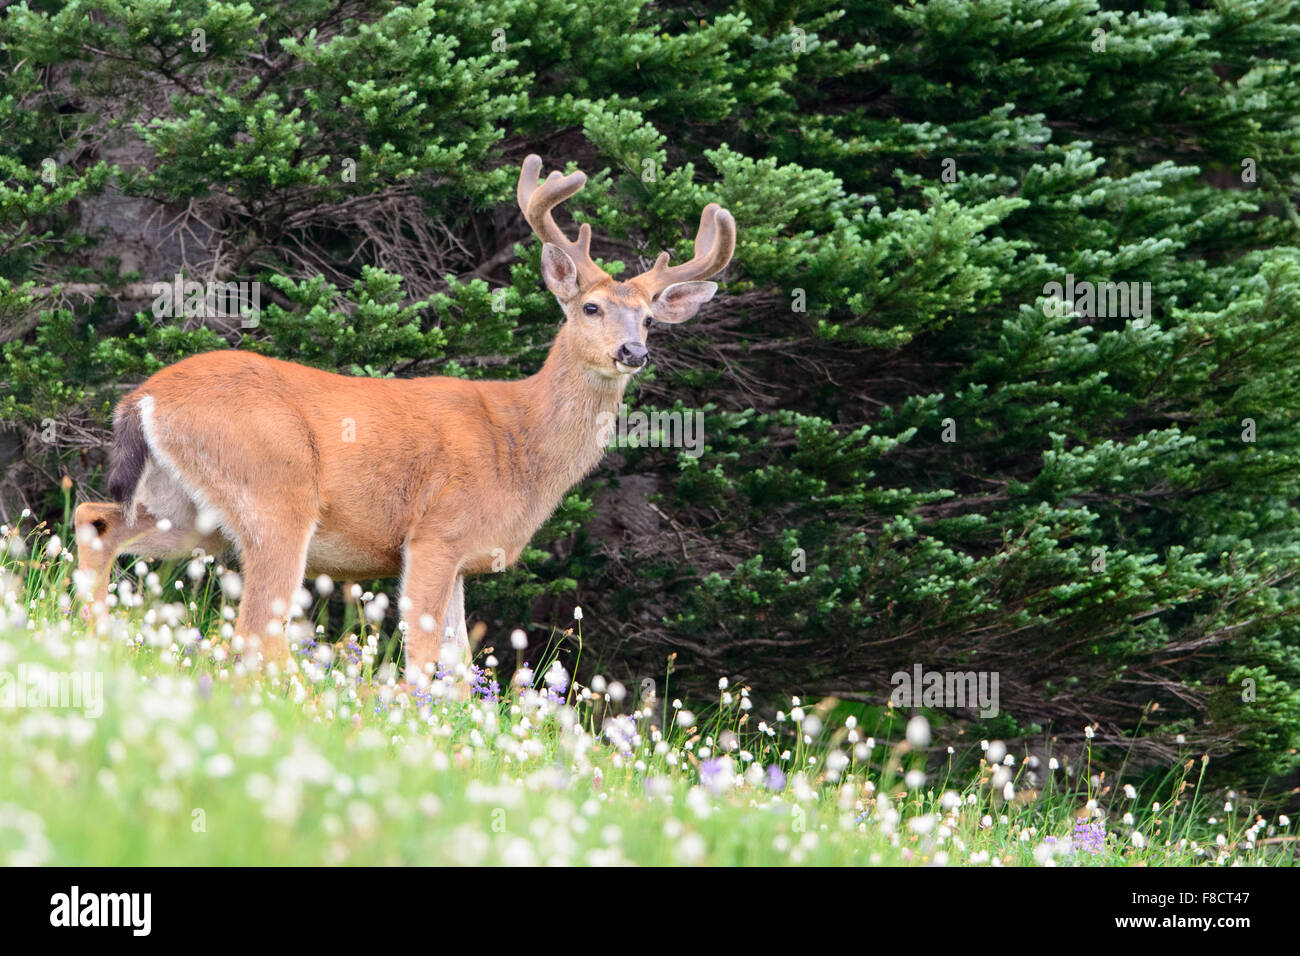 Black-tailed deer buck (Odocoileus hemionus columbianus) in a field of wildflowers, Pacific Northwest - Stock Image